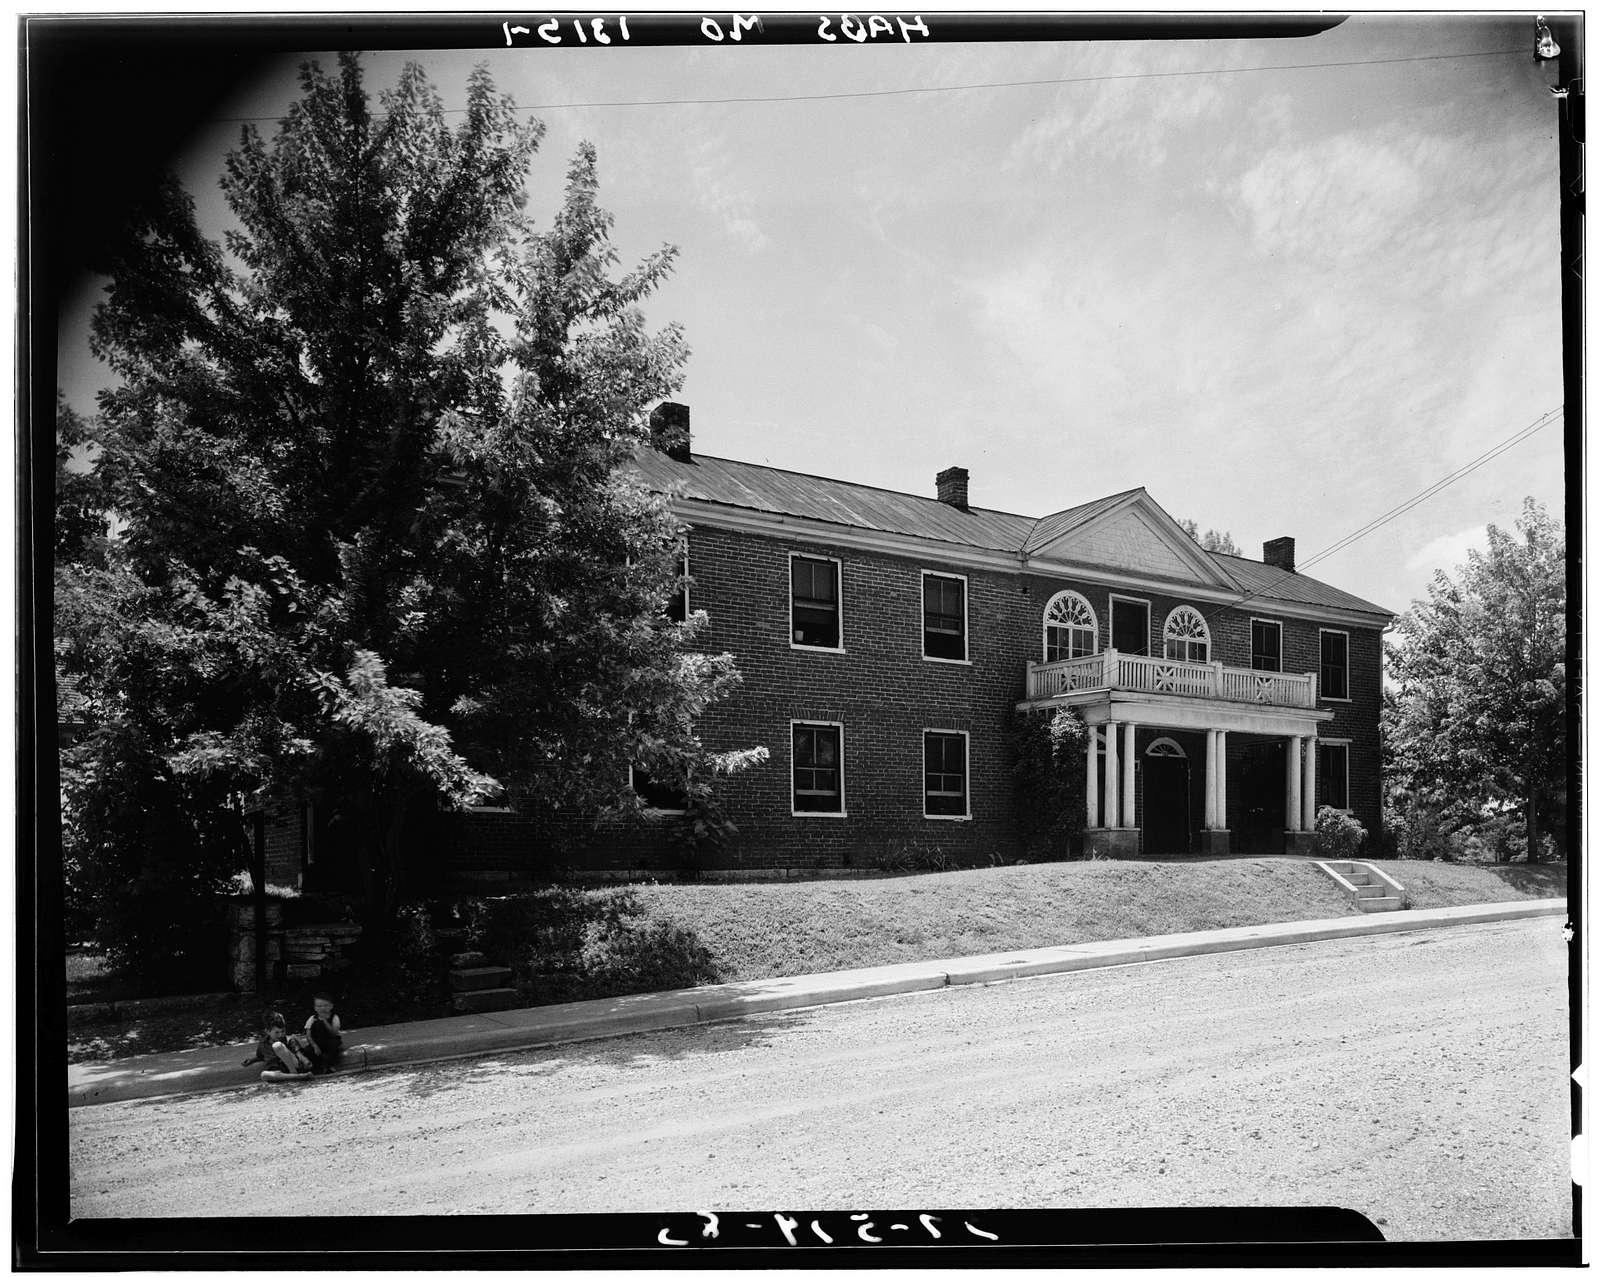 Kneibert House, Main & High Streets, Jackson, Cape Girardeau County, MO